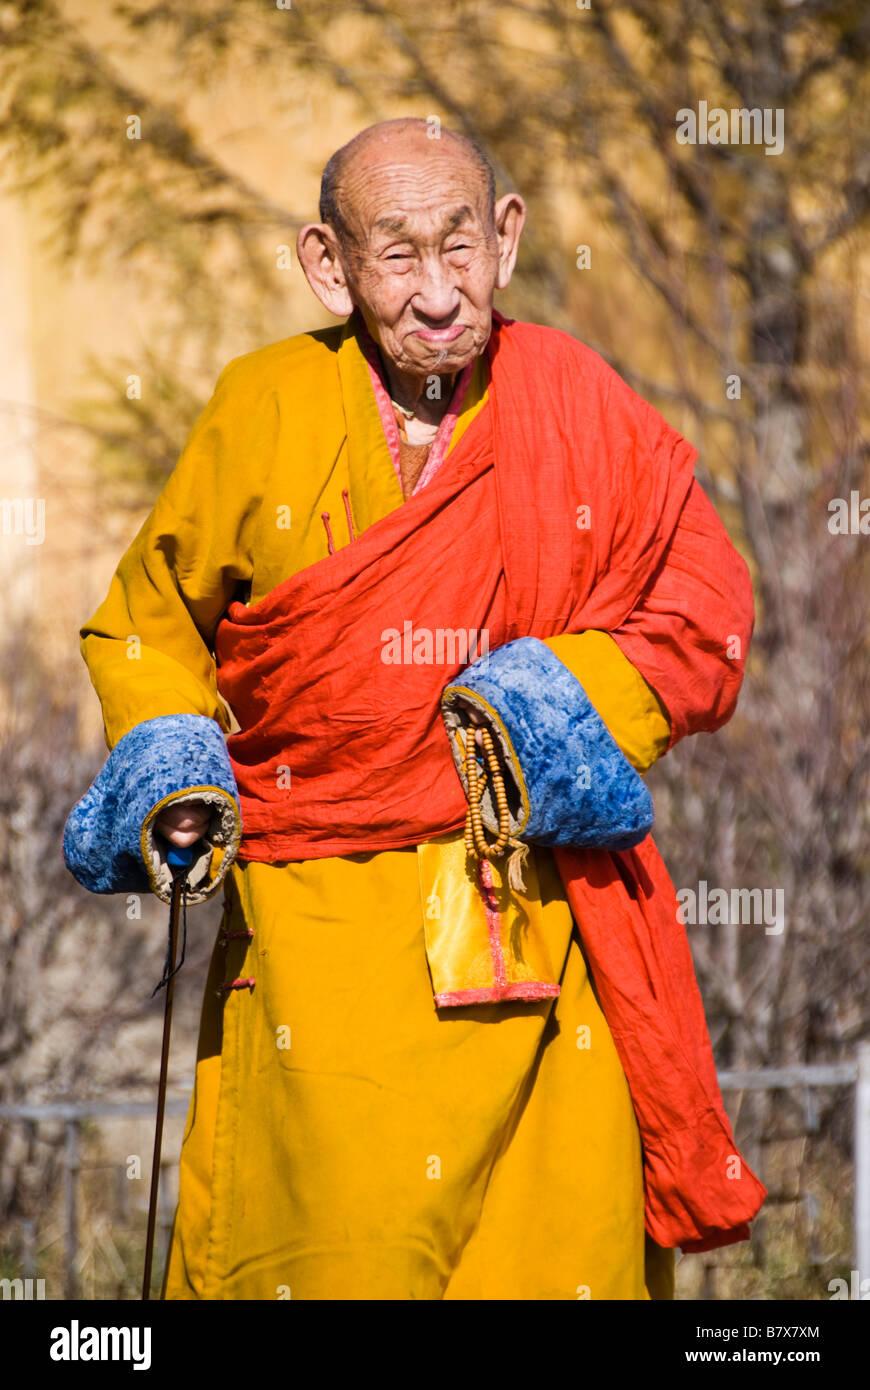 Buddhist monk at the Gandantegchinlen Khiid monastery Ulaan Bataar Mongolia - Stock Image